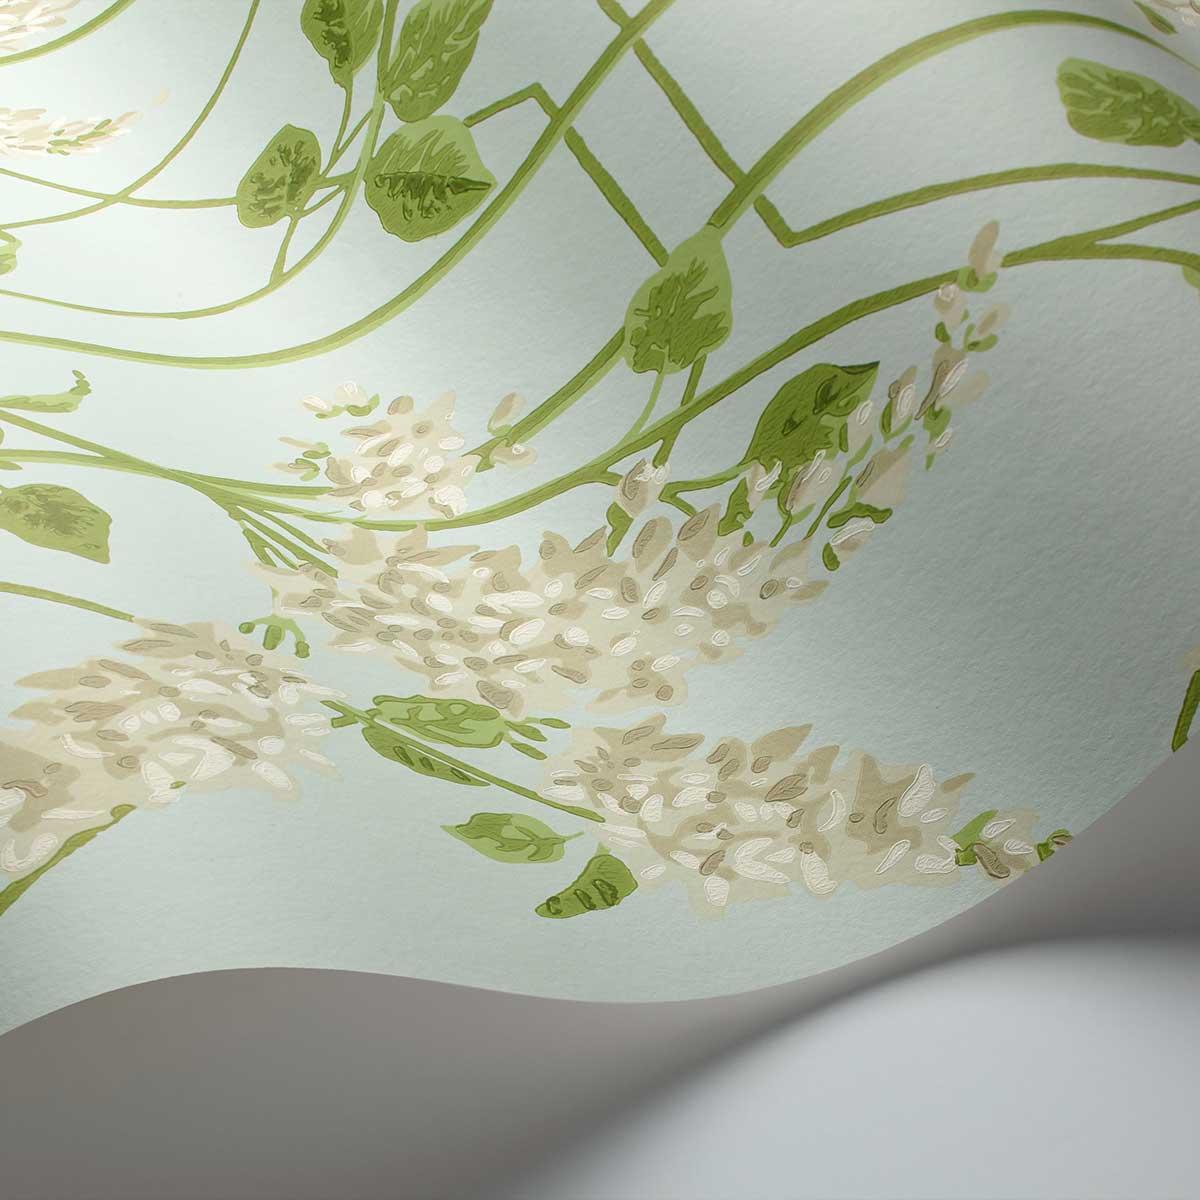 Cole & Son Wisteria Stone / Olive / Duck Egg Wallpaper - Product code: 115/5014